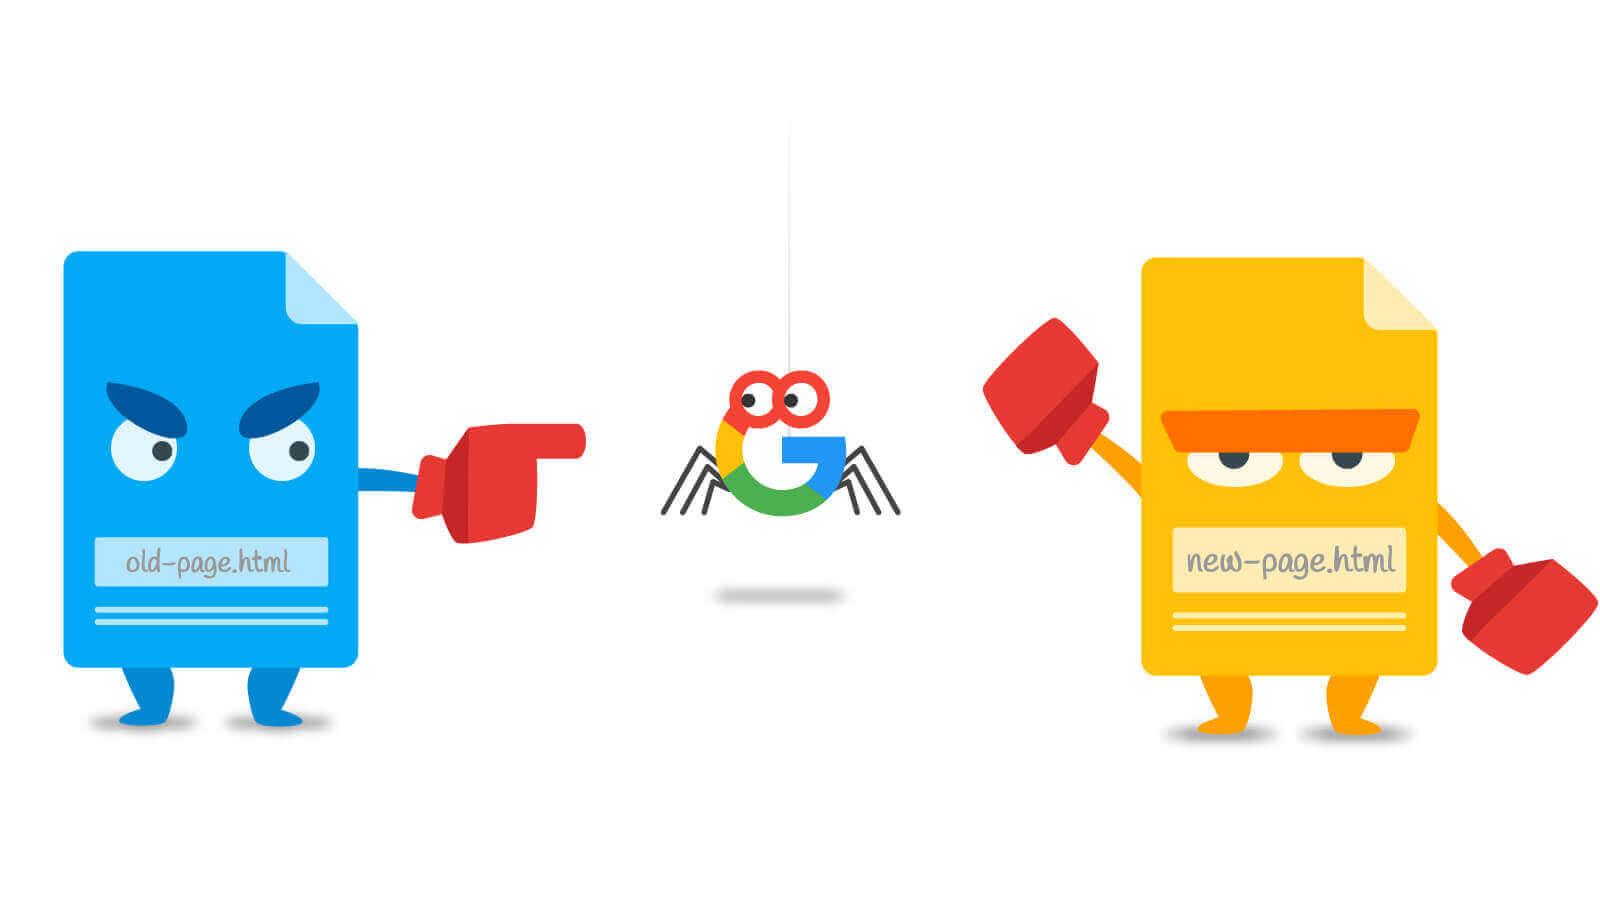 redirect pengarahan halaman doman lama domain baru htaccess - rio bermano